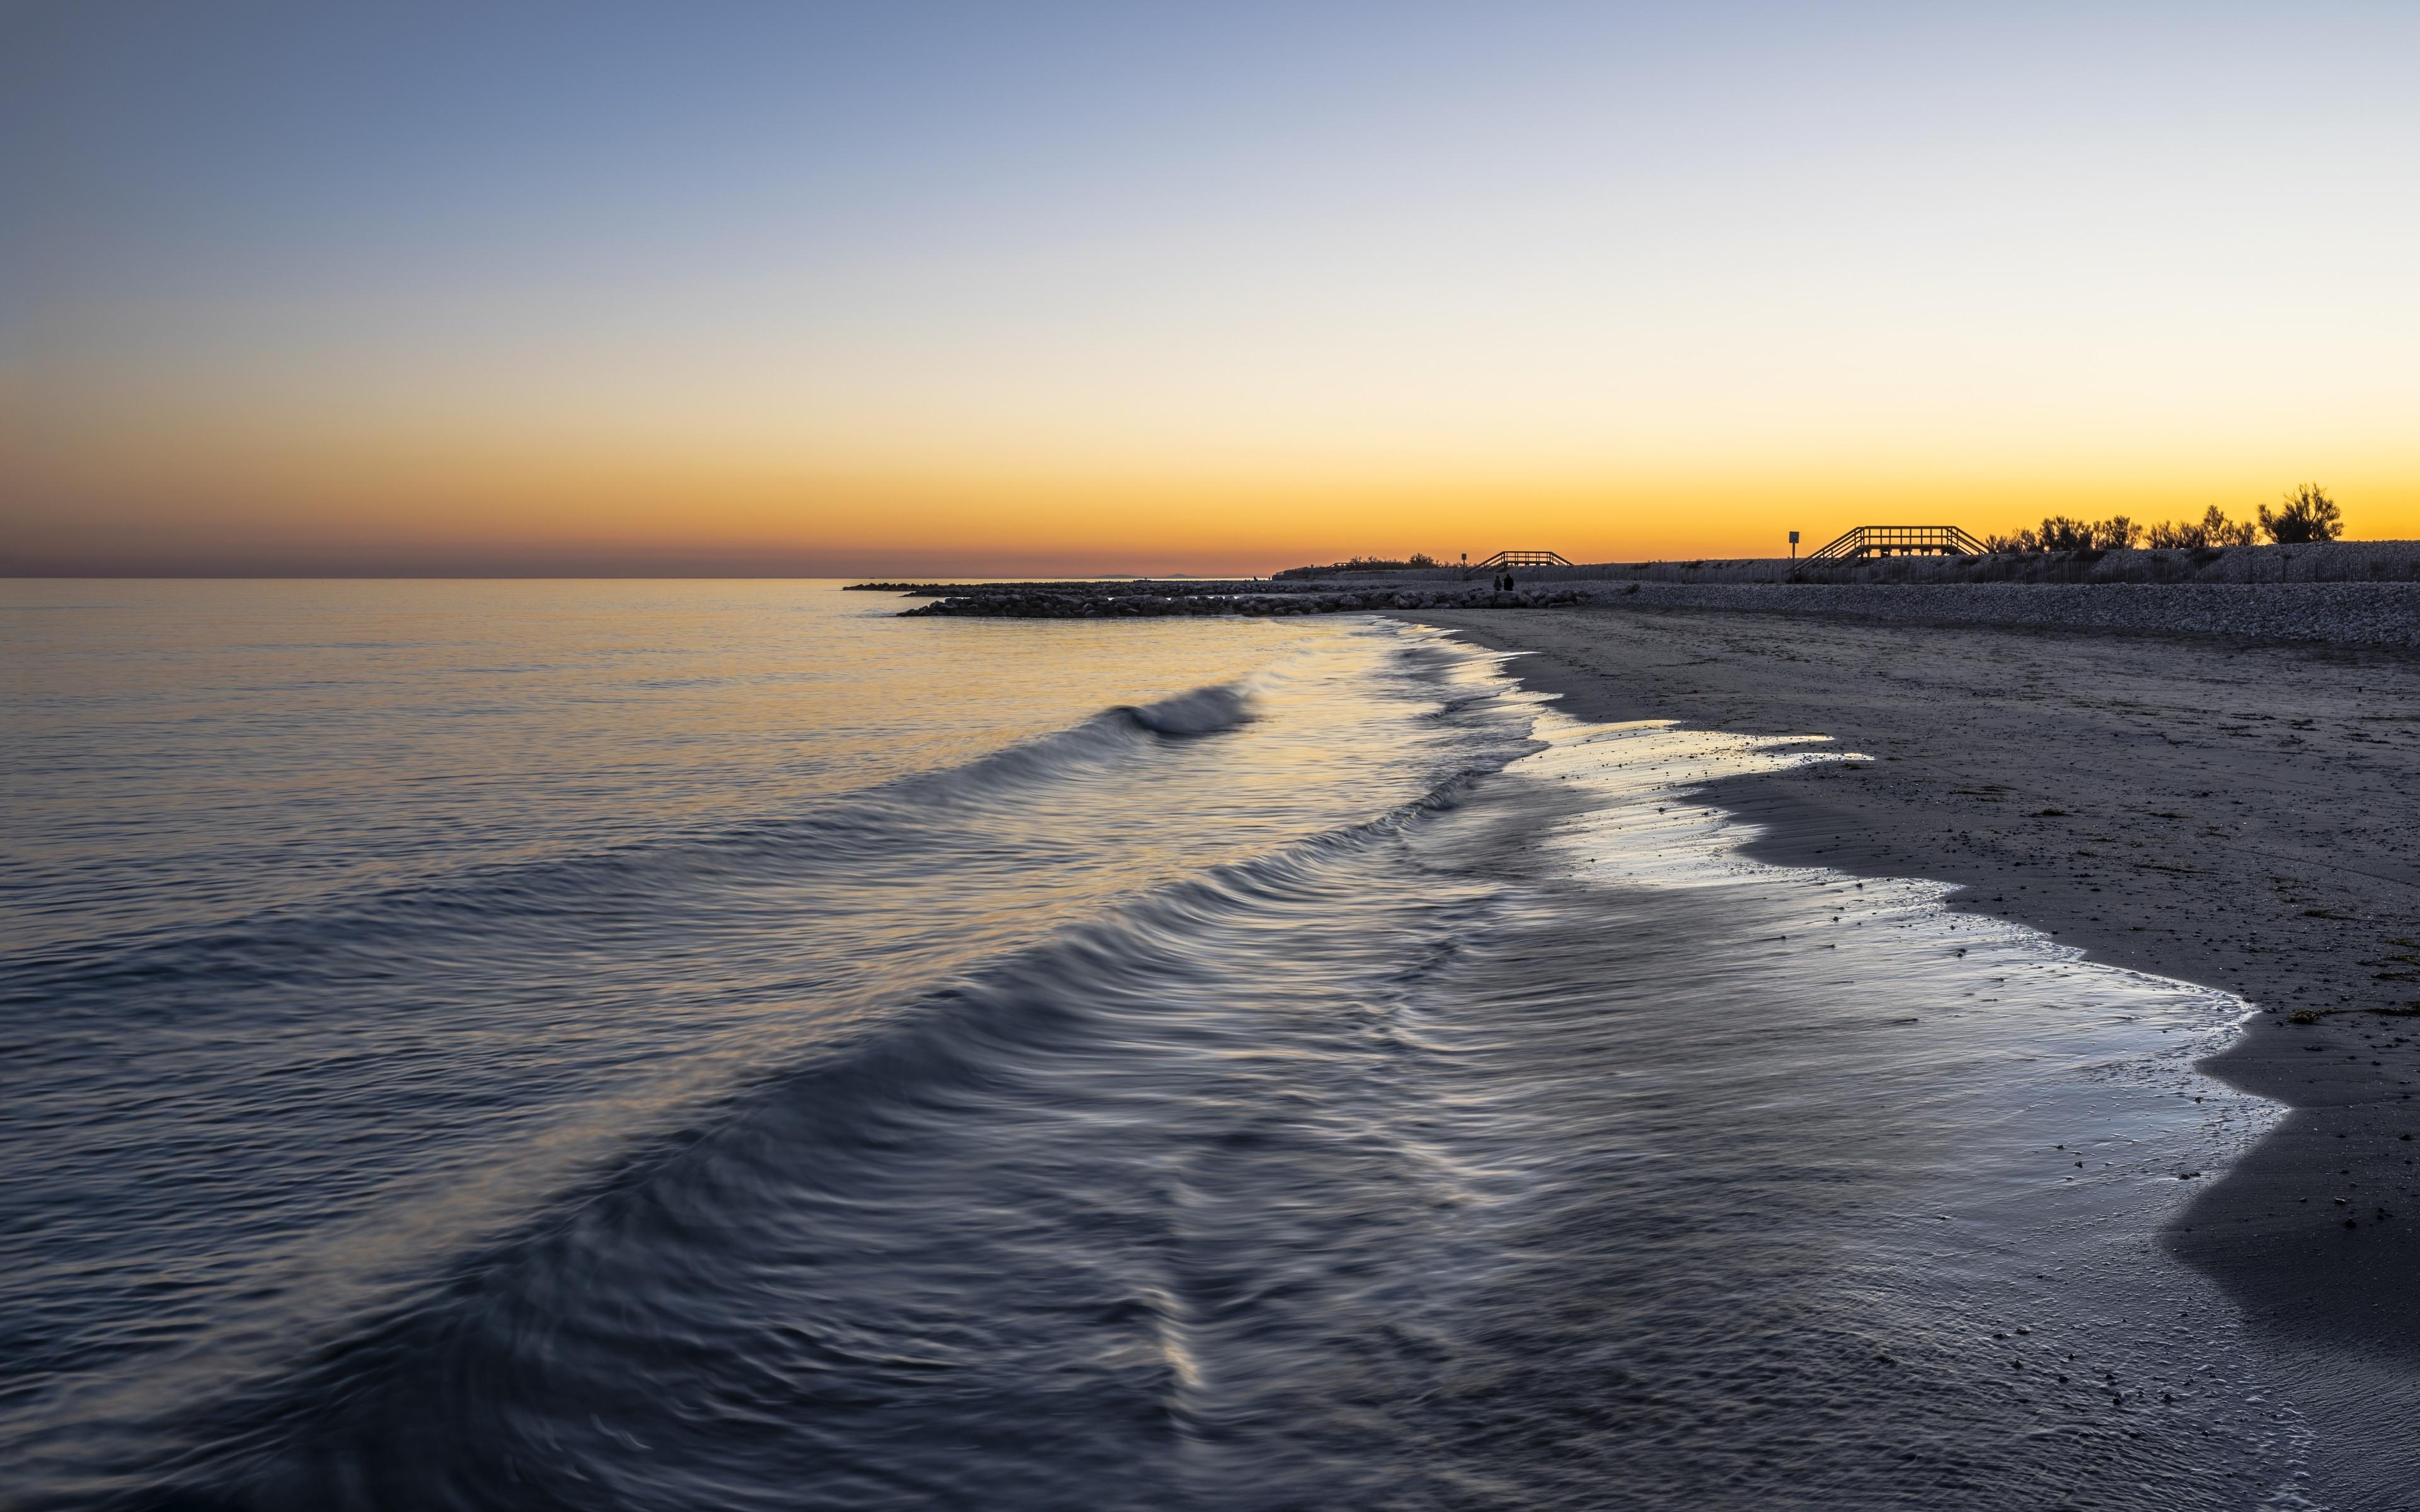 Aresquiers Beach, Frontignan, Herault, France